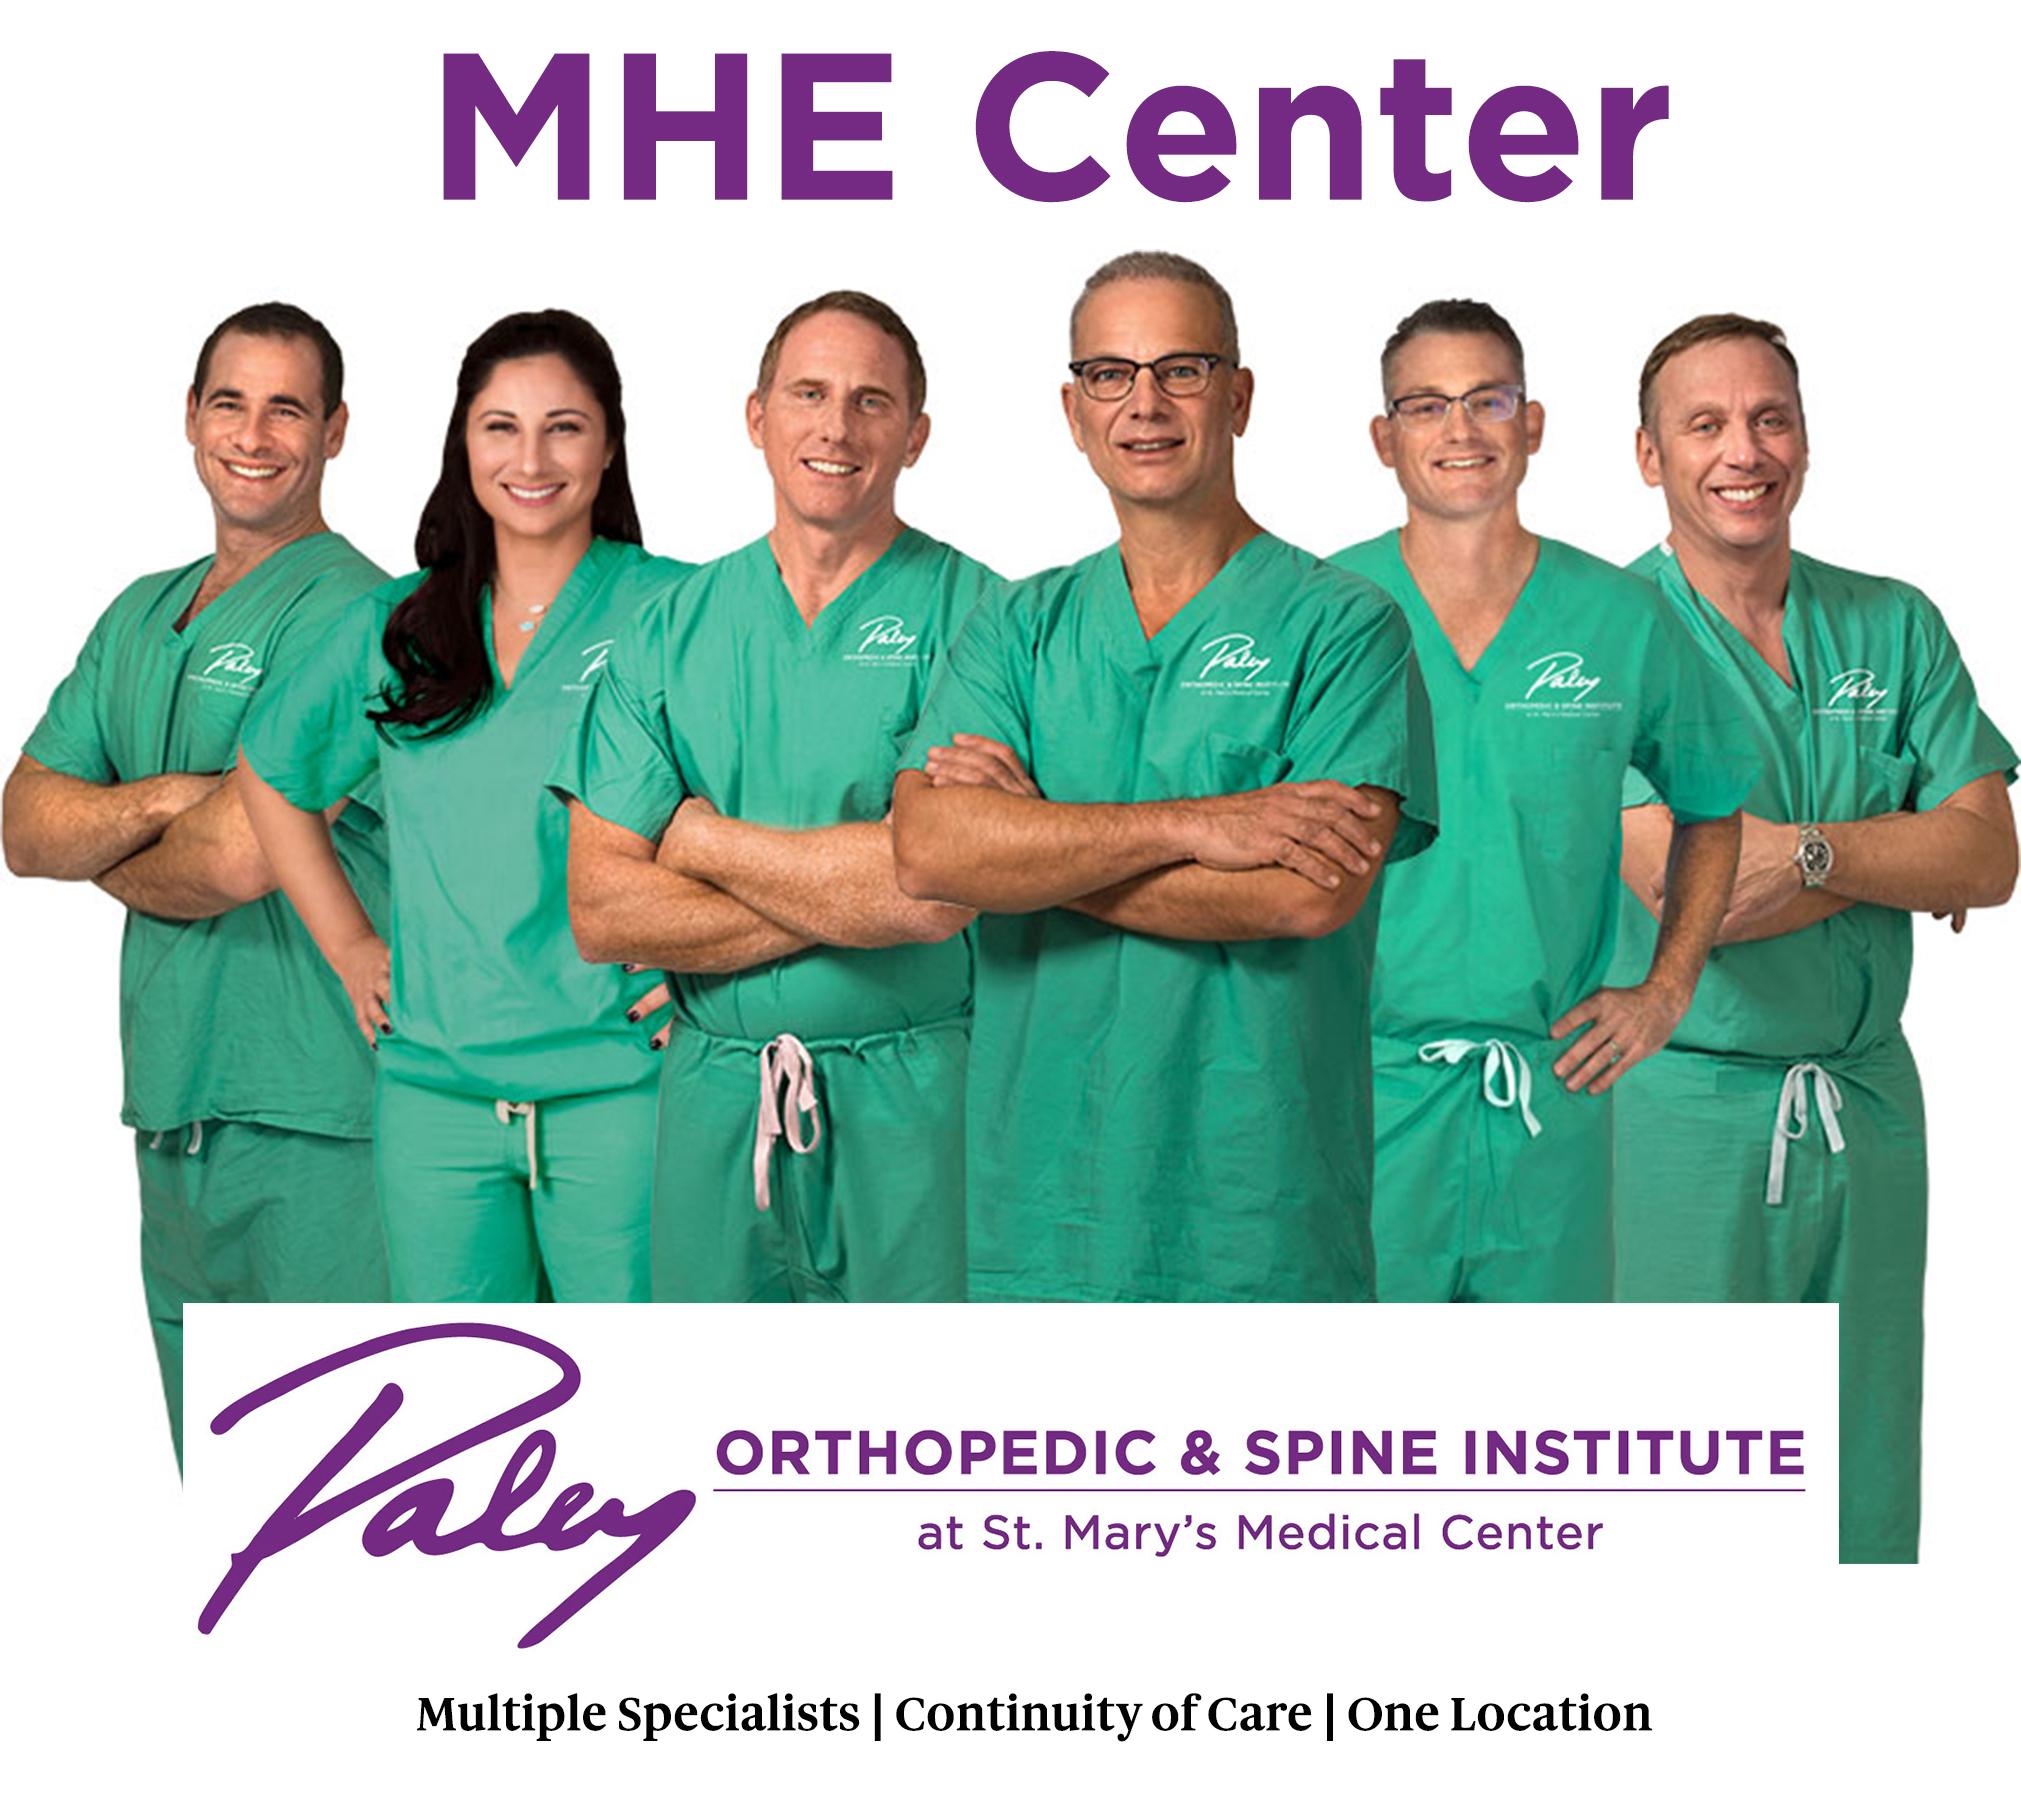 MHE Center